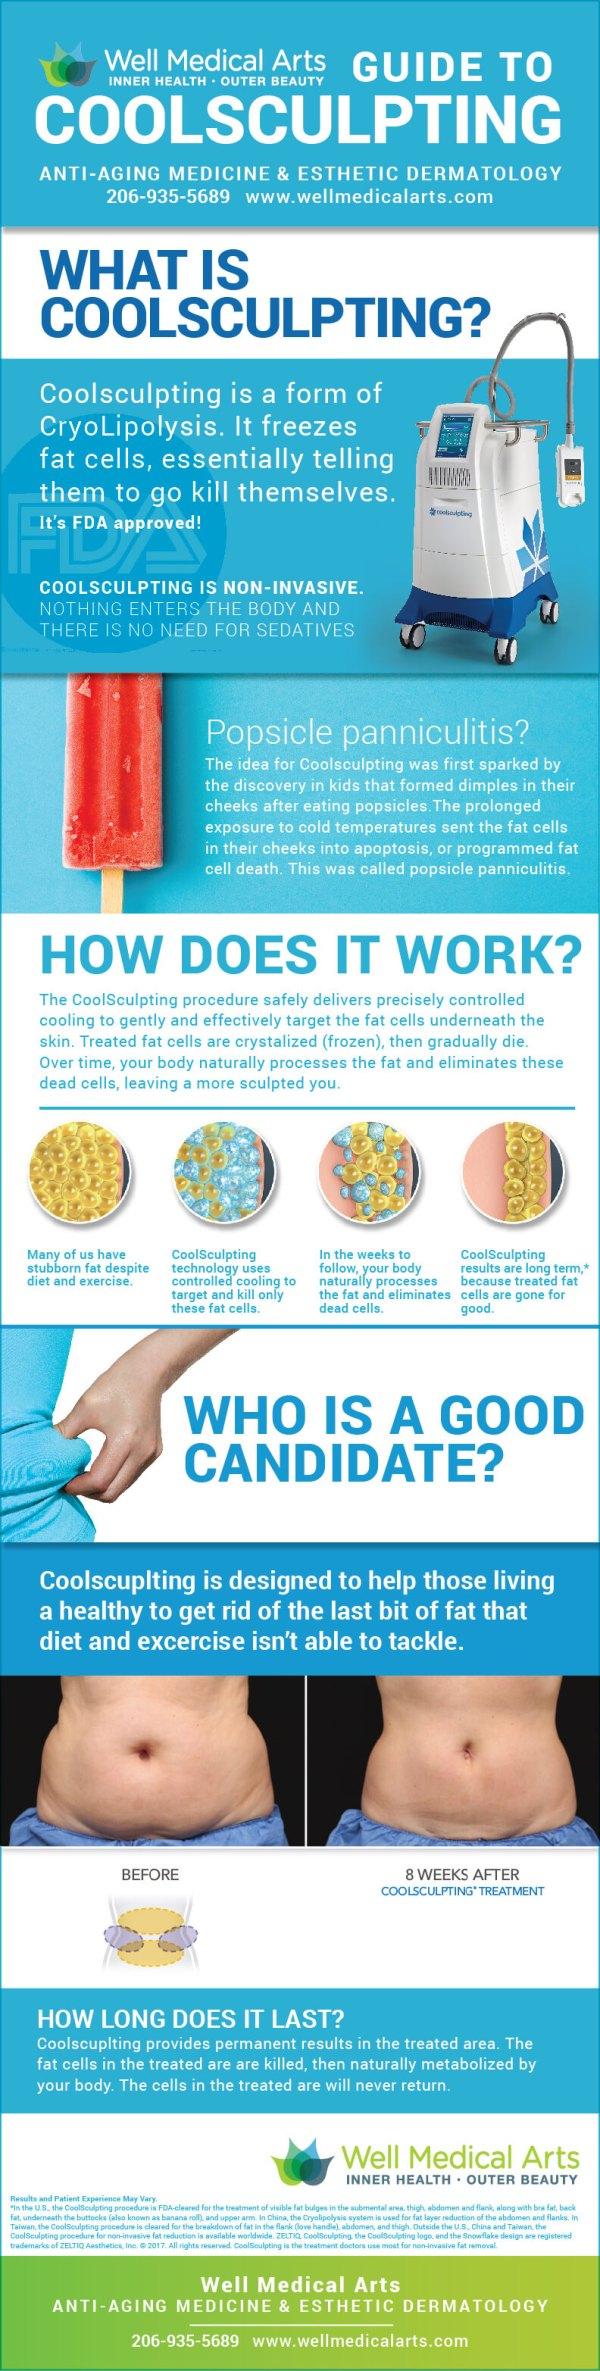 Coolsculpting-Seattle-FAQ-Well-Medical-Arts